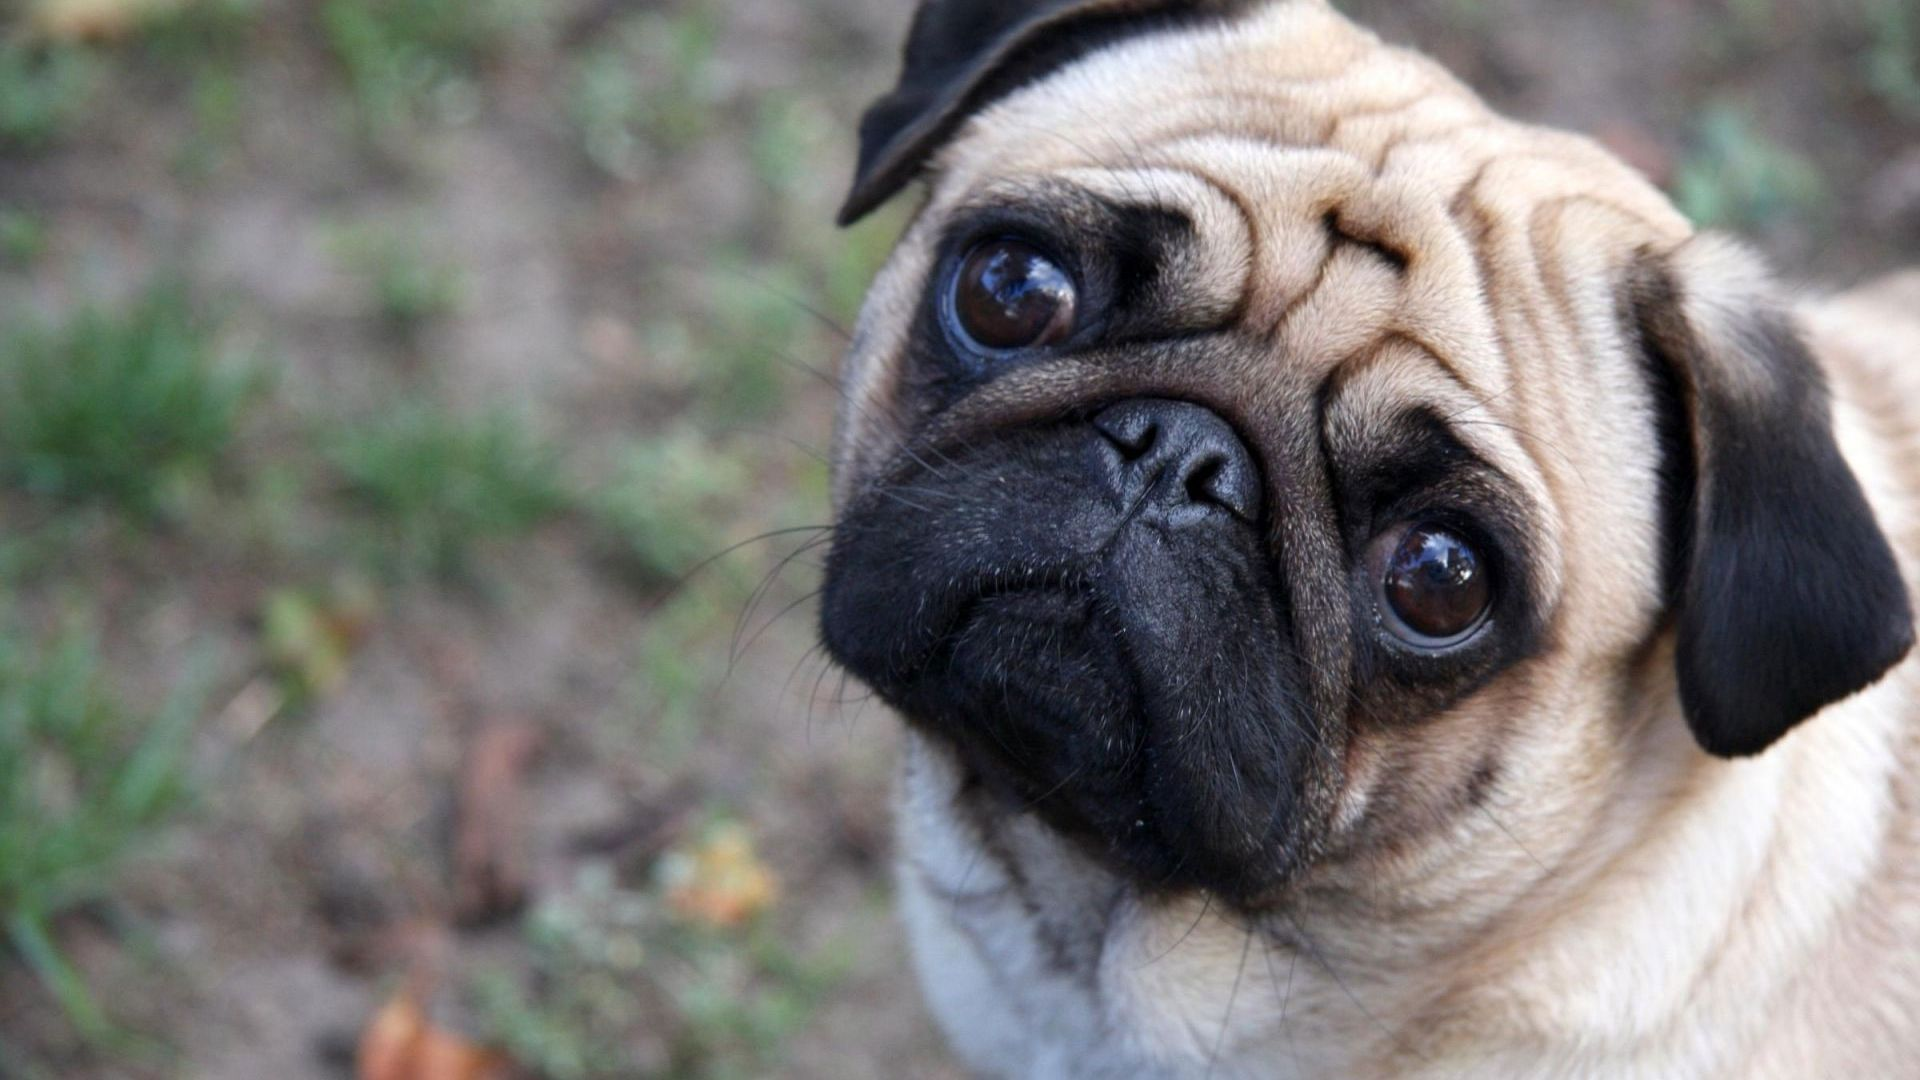 hd pics photos best beautiful pug dog attractive face close up hd 1920x1080